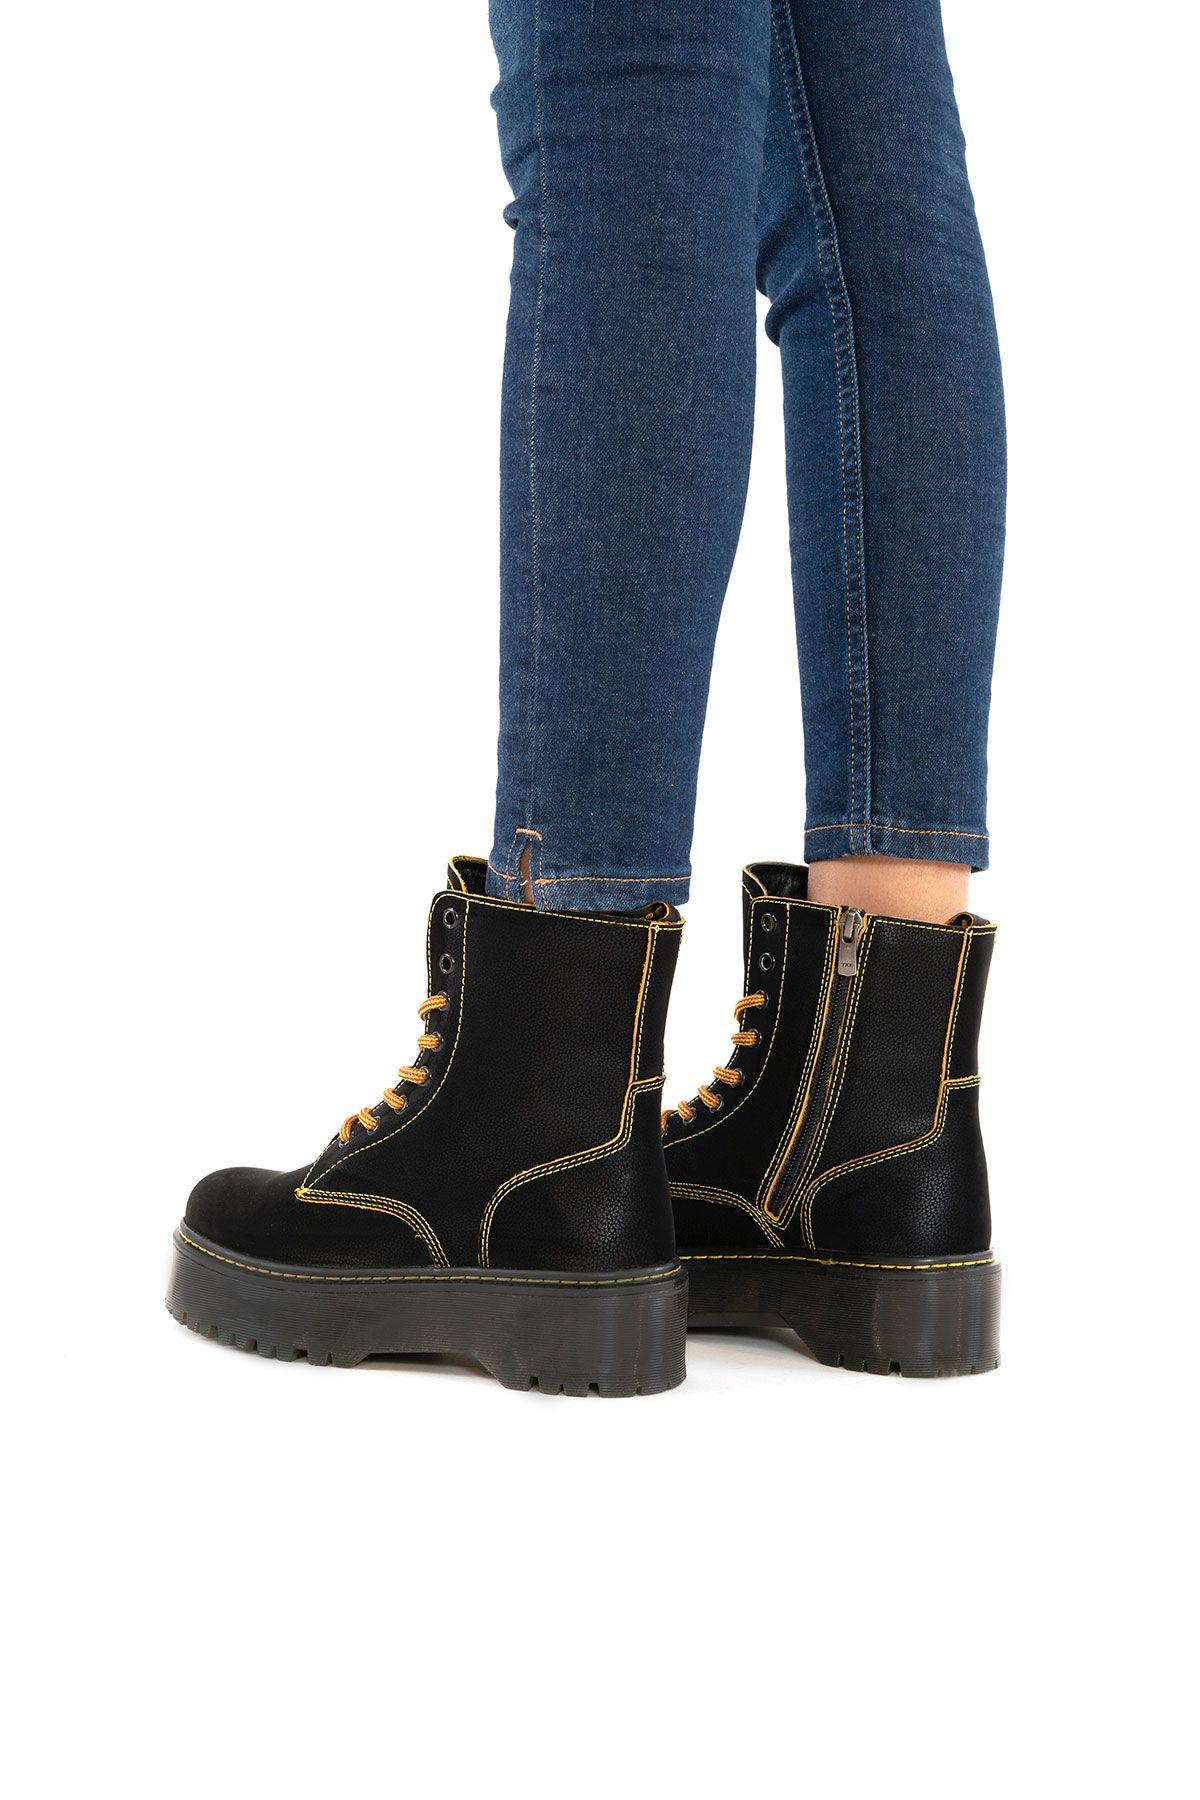 Pegia Genuine Nubuck Women's Boots 500712 Black